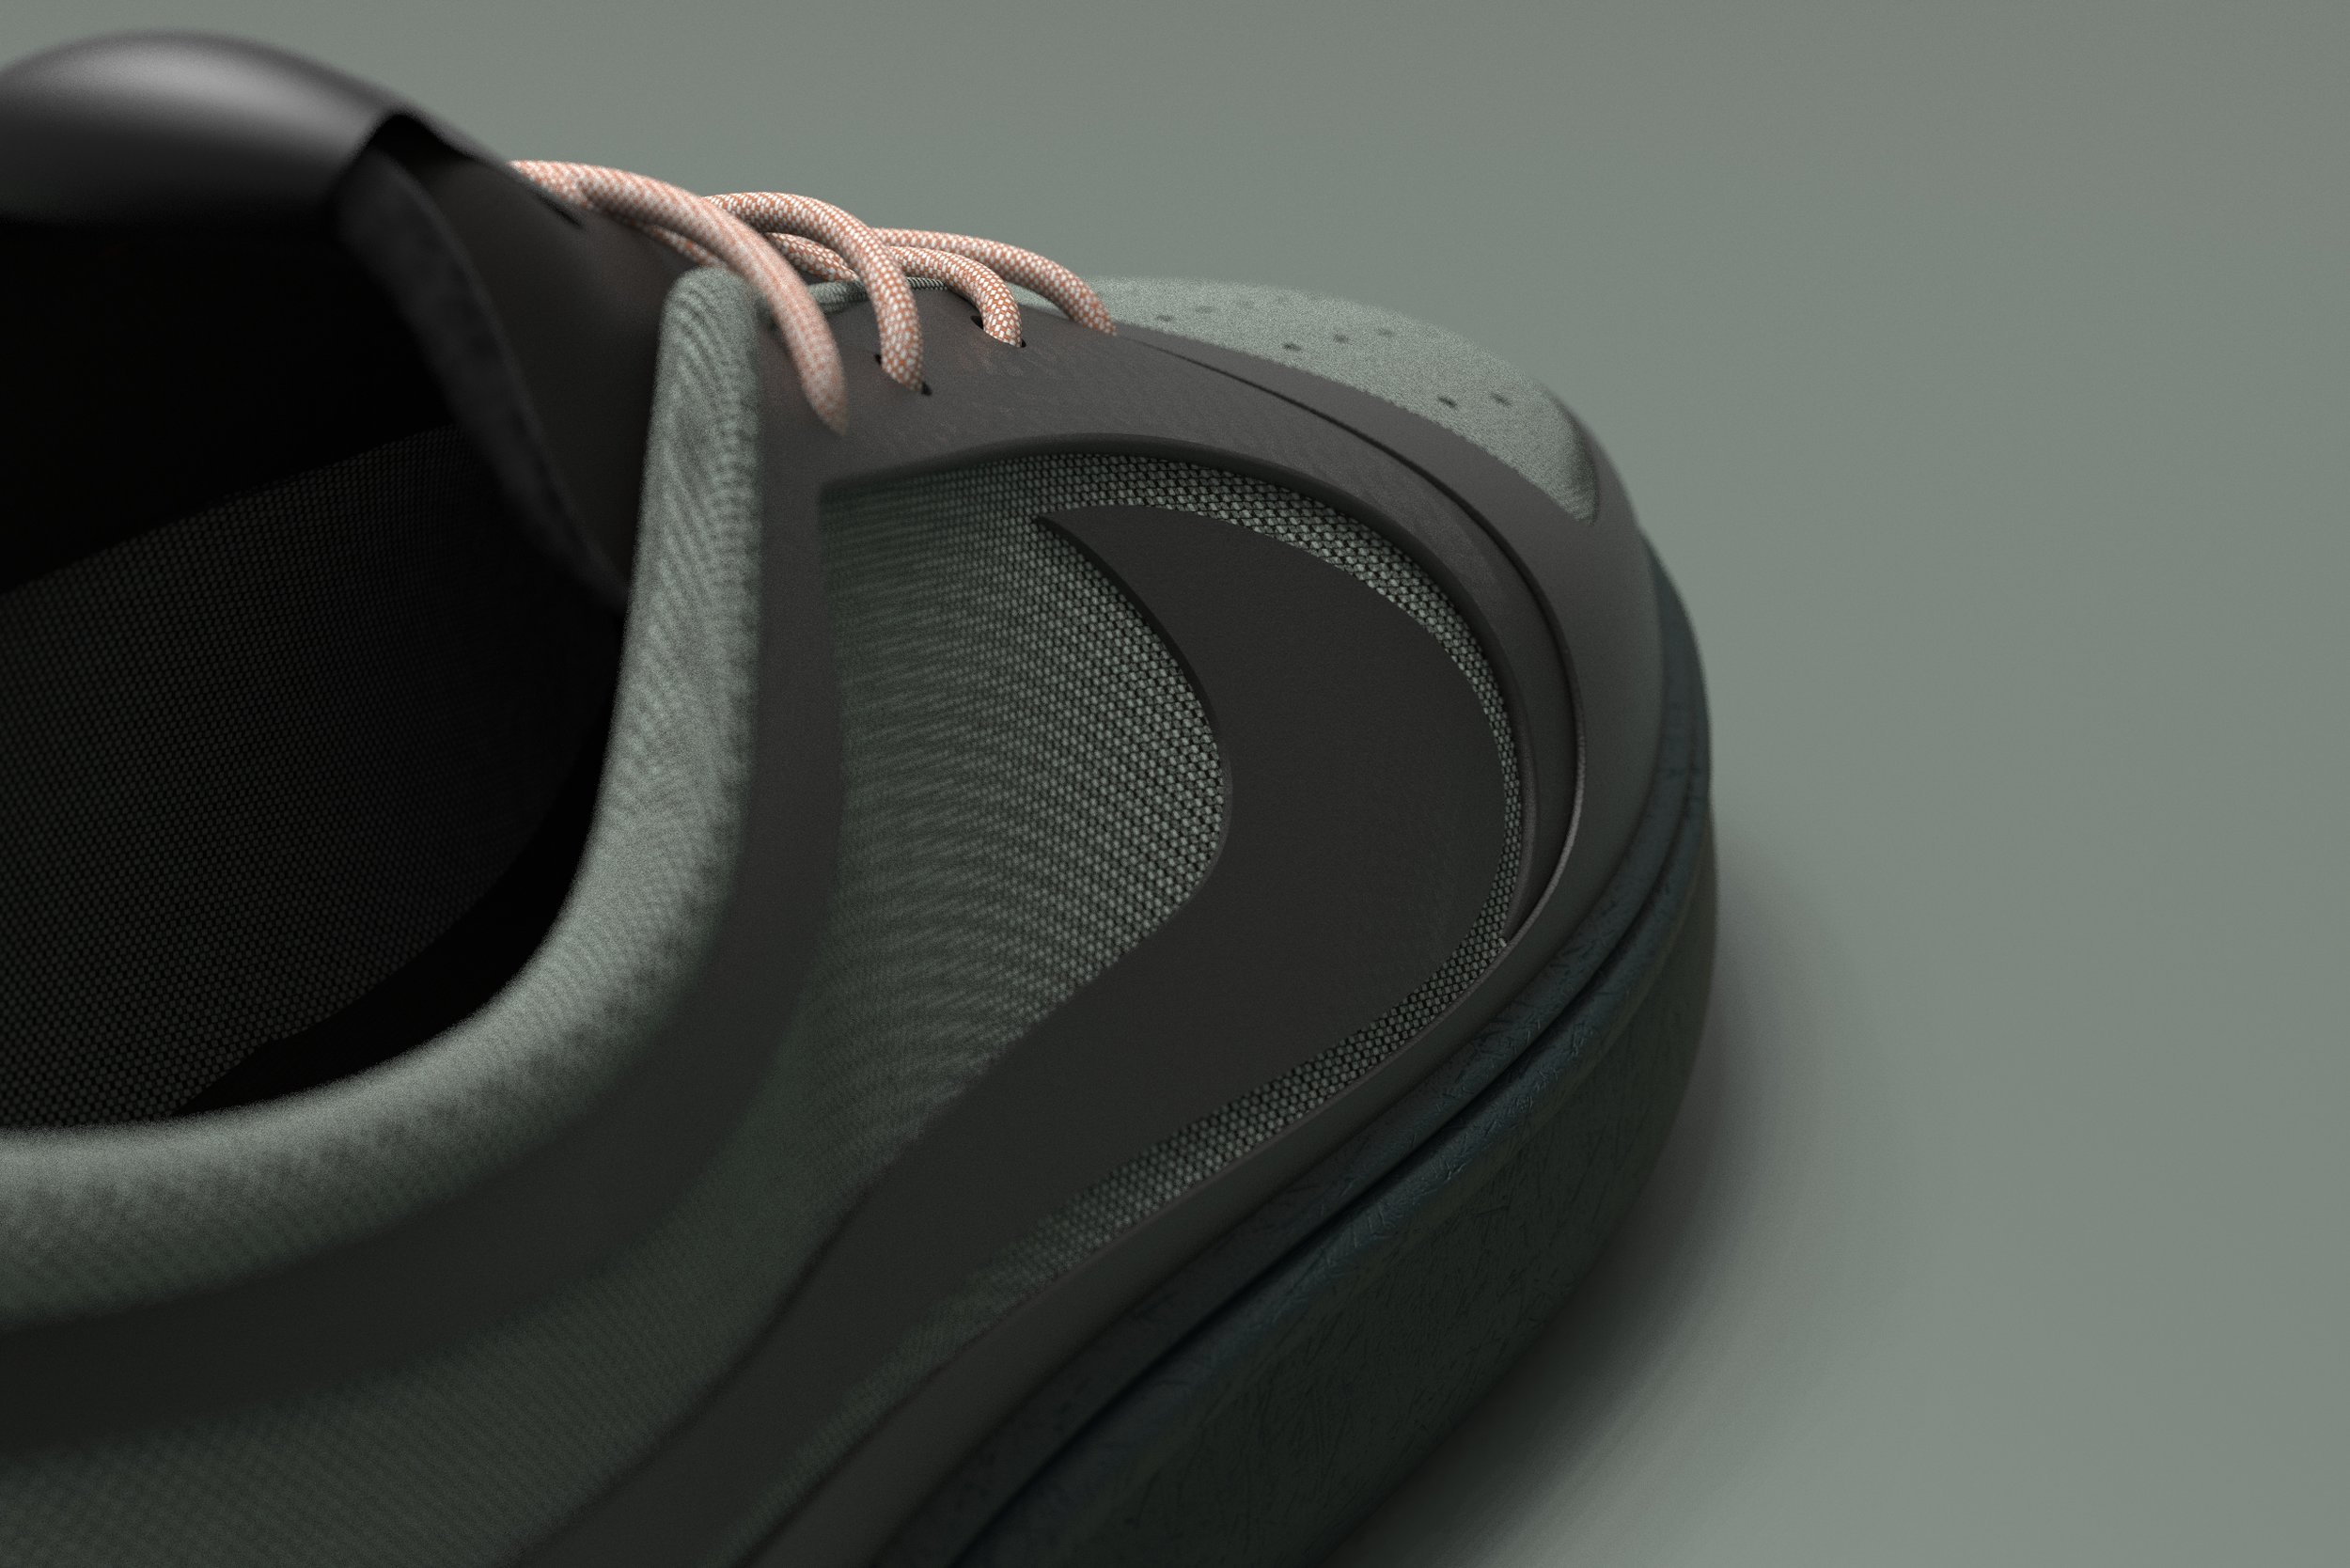 Shoe OFFSET COLOR WAY.19.jpg